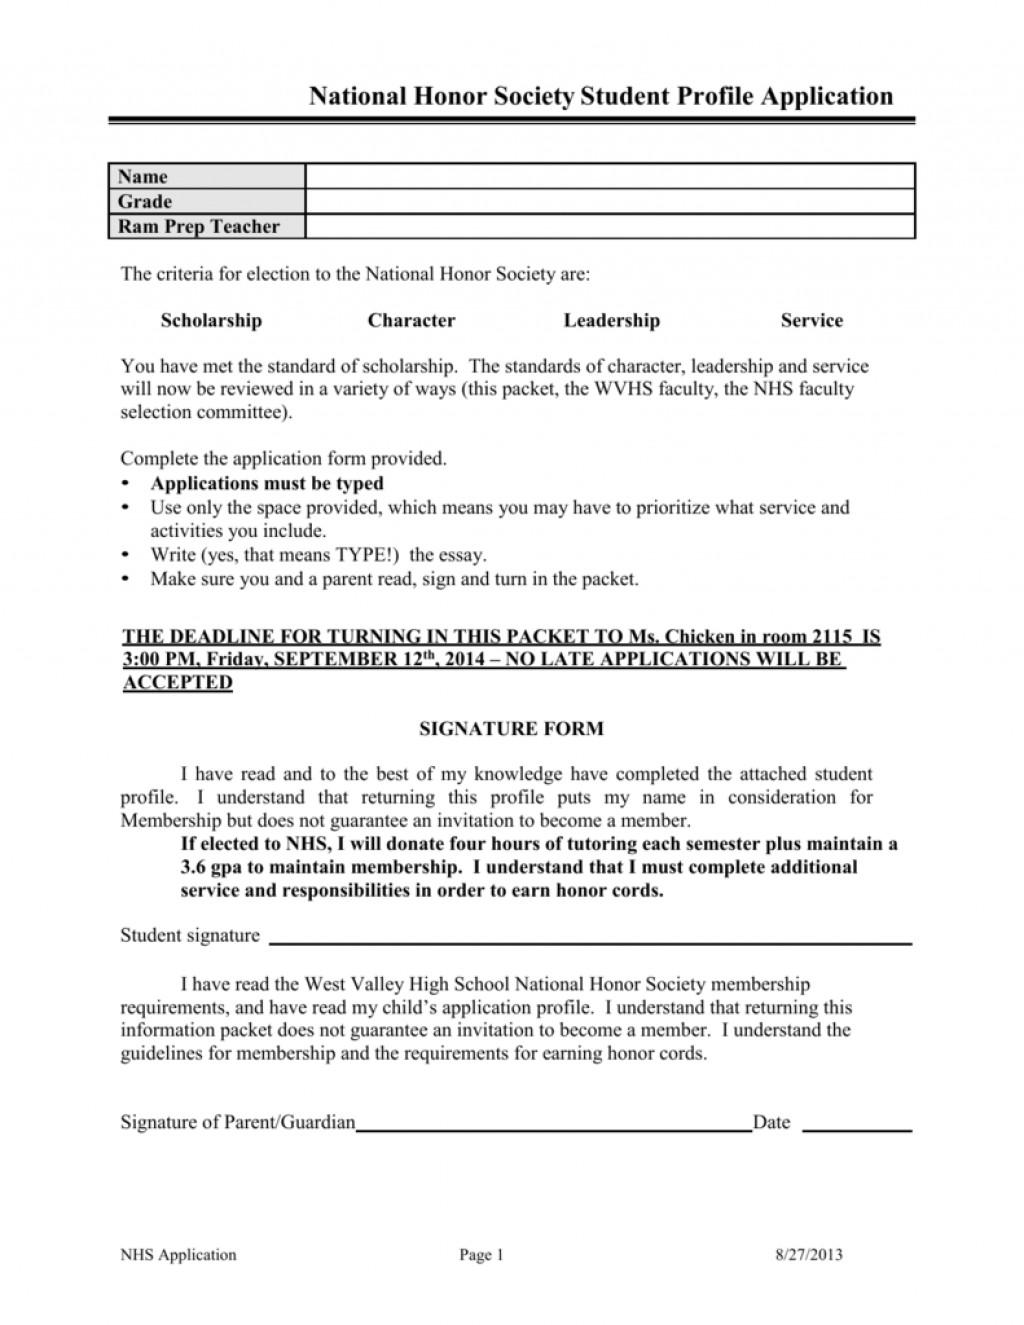 021 006915569 1 National Honor Society Application Essay Sensational Examples Service Junior Scholarship Large